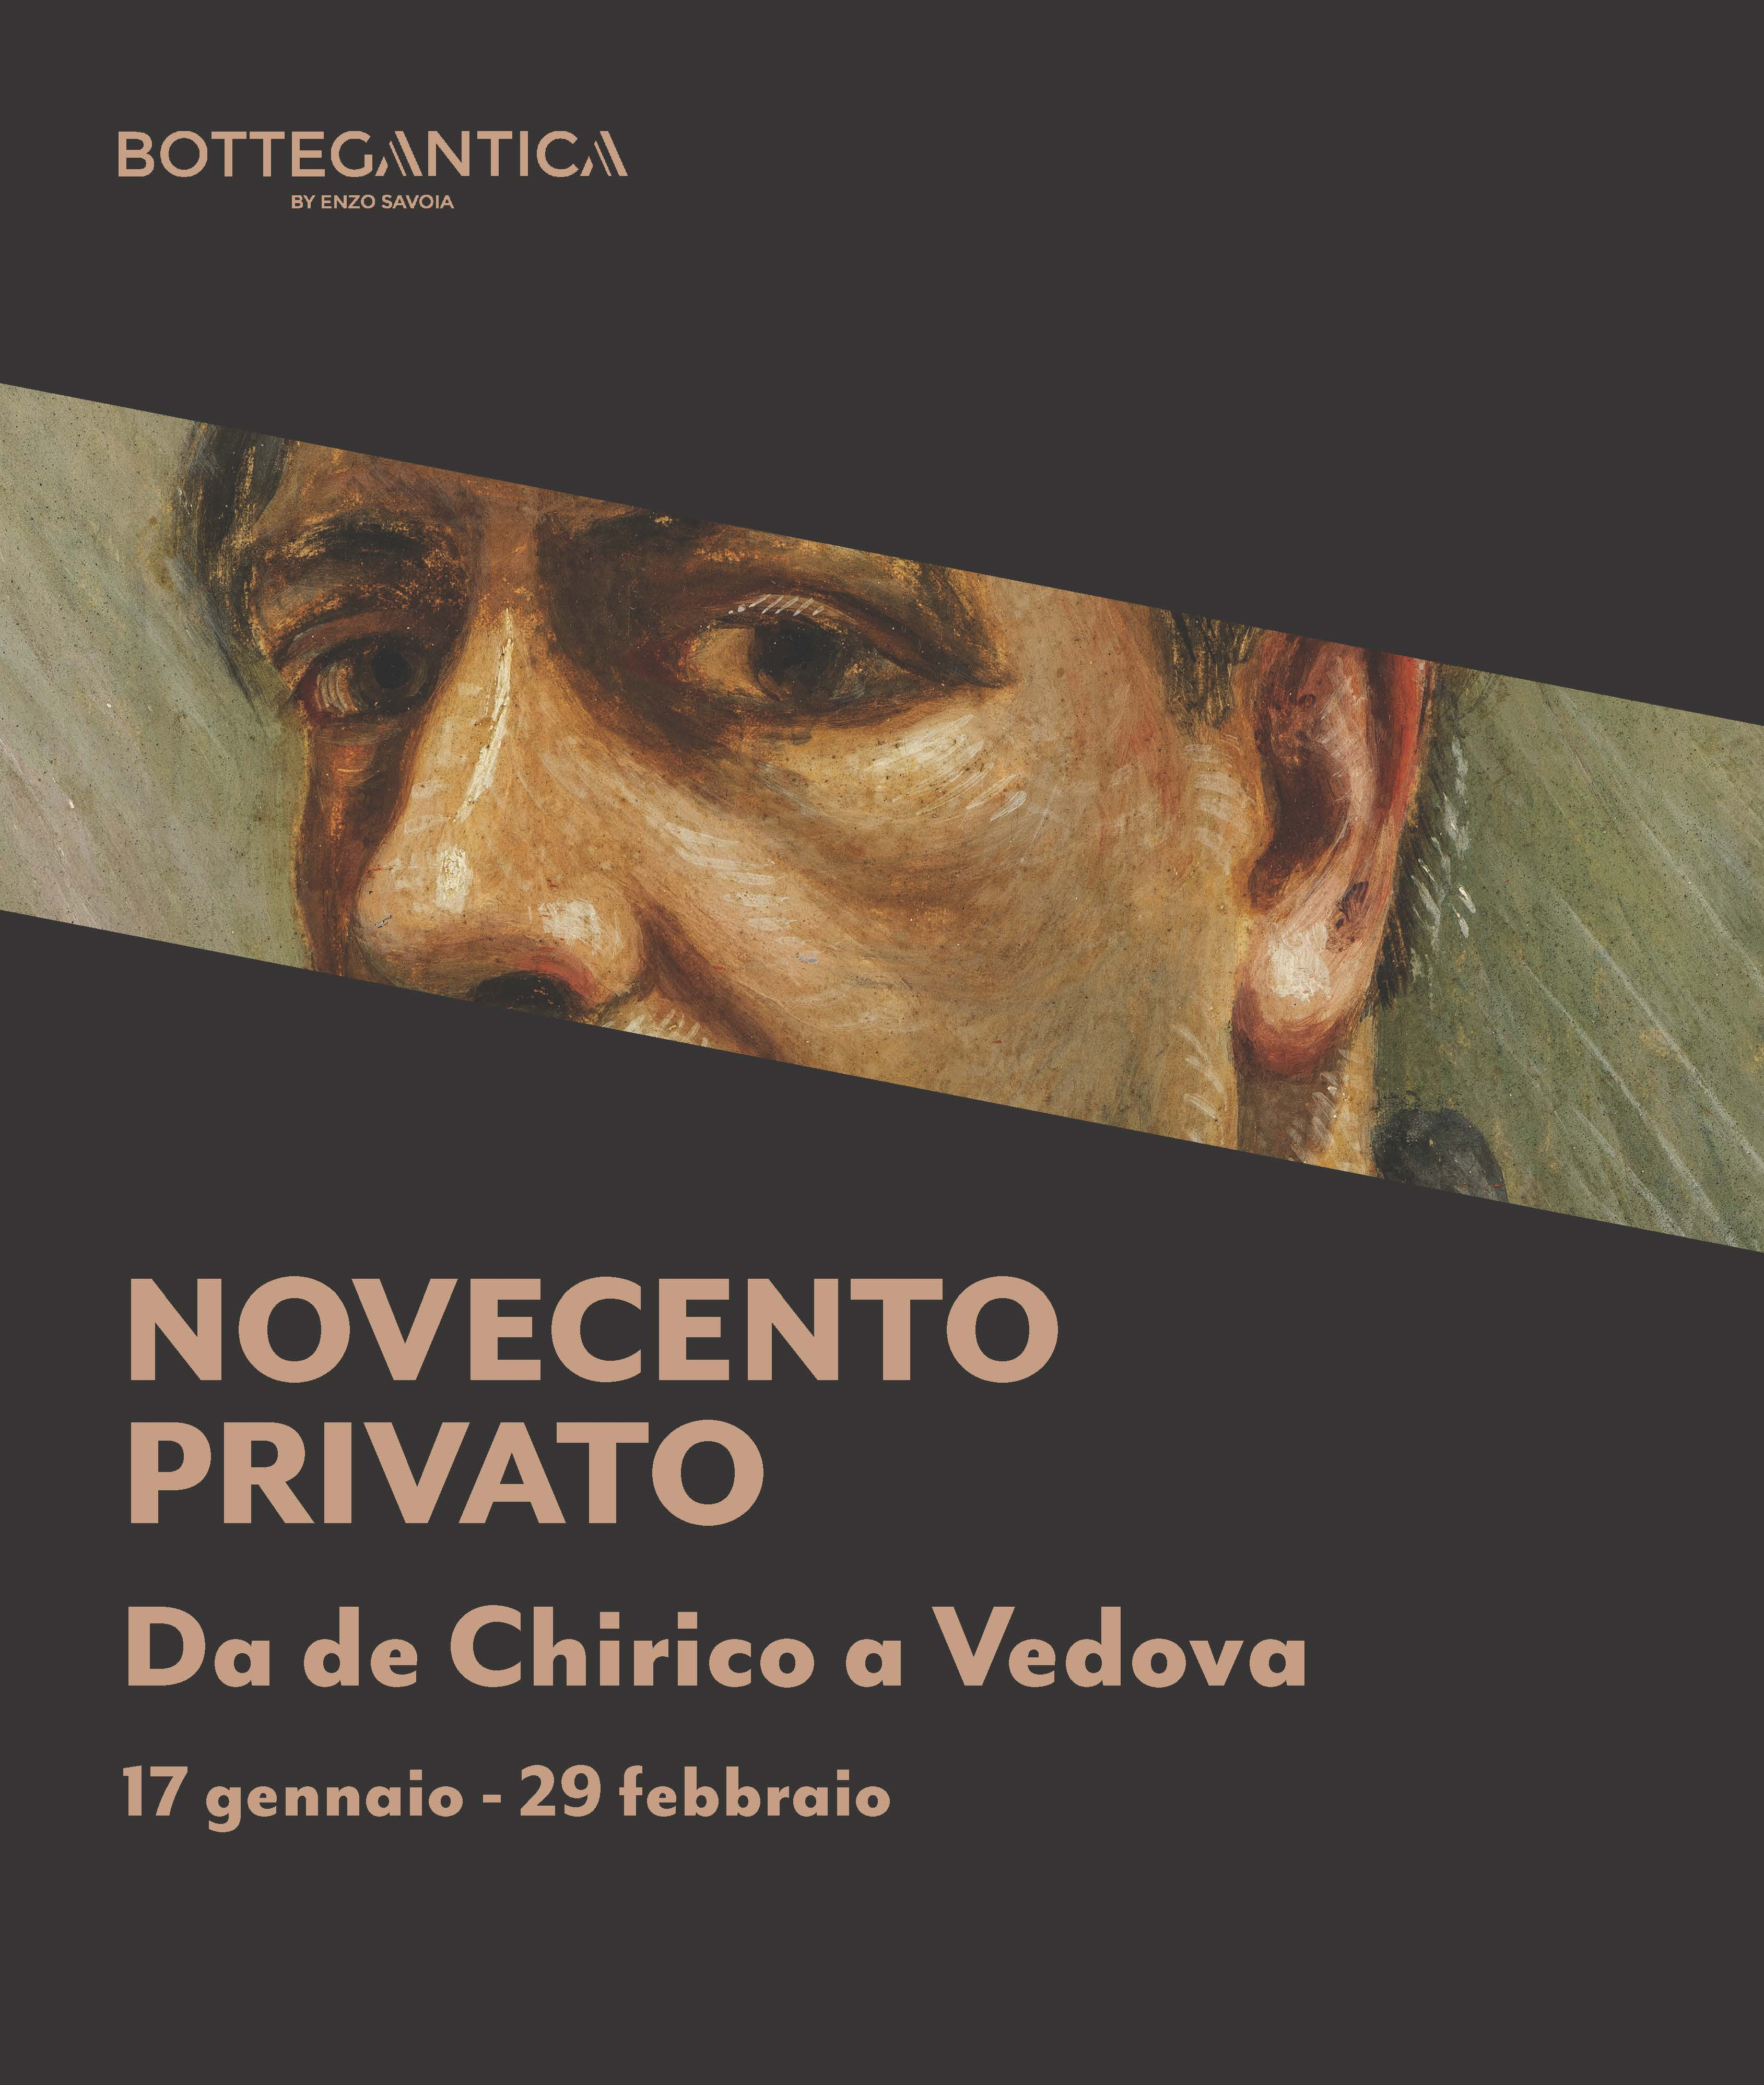 Catalogo Novecento Privato - Bottegantica